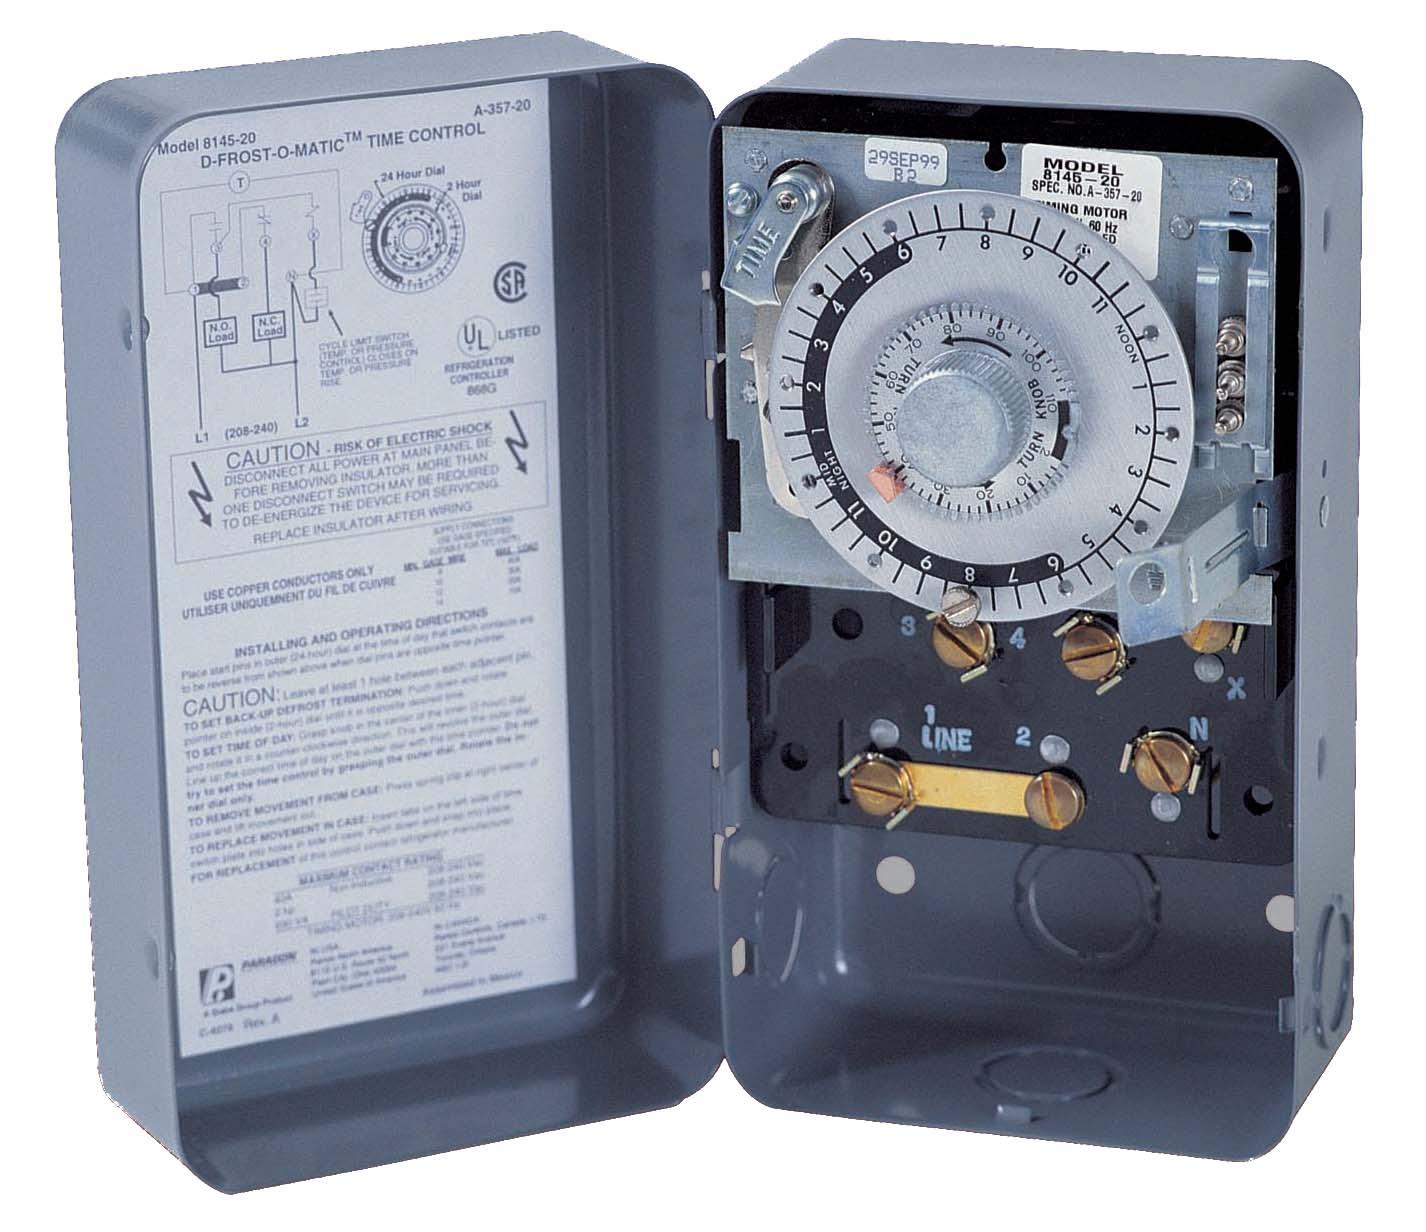 Paragon Defrost Timer Wiring Diagram Gandul 457779119 – Defrost Timer Wiring Diagram